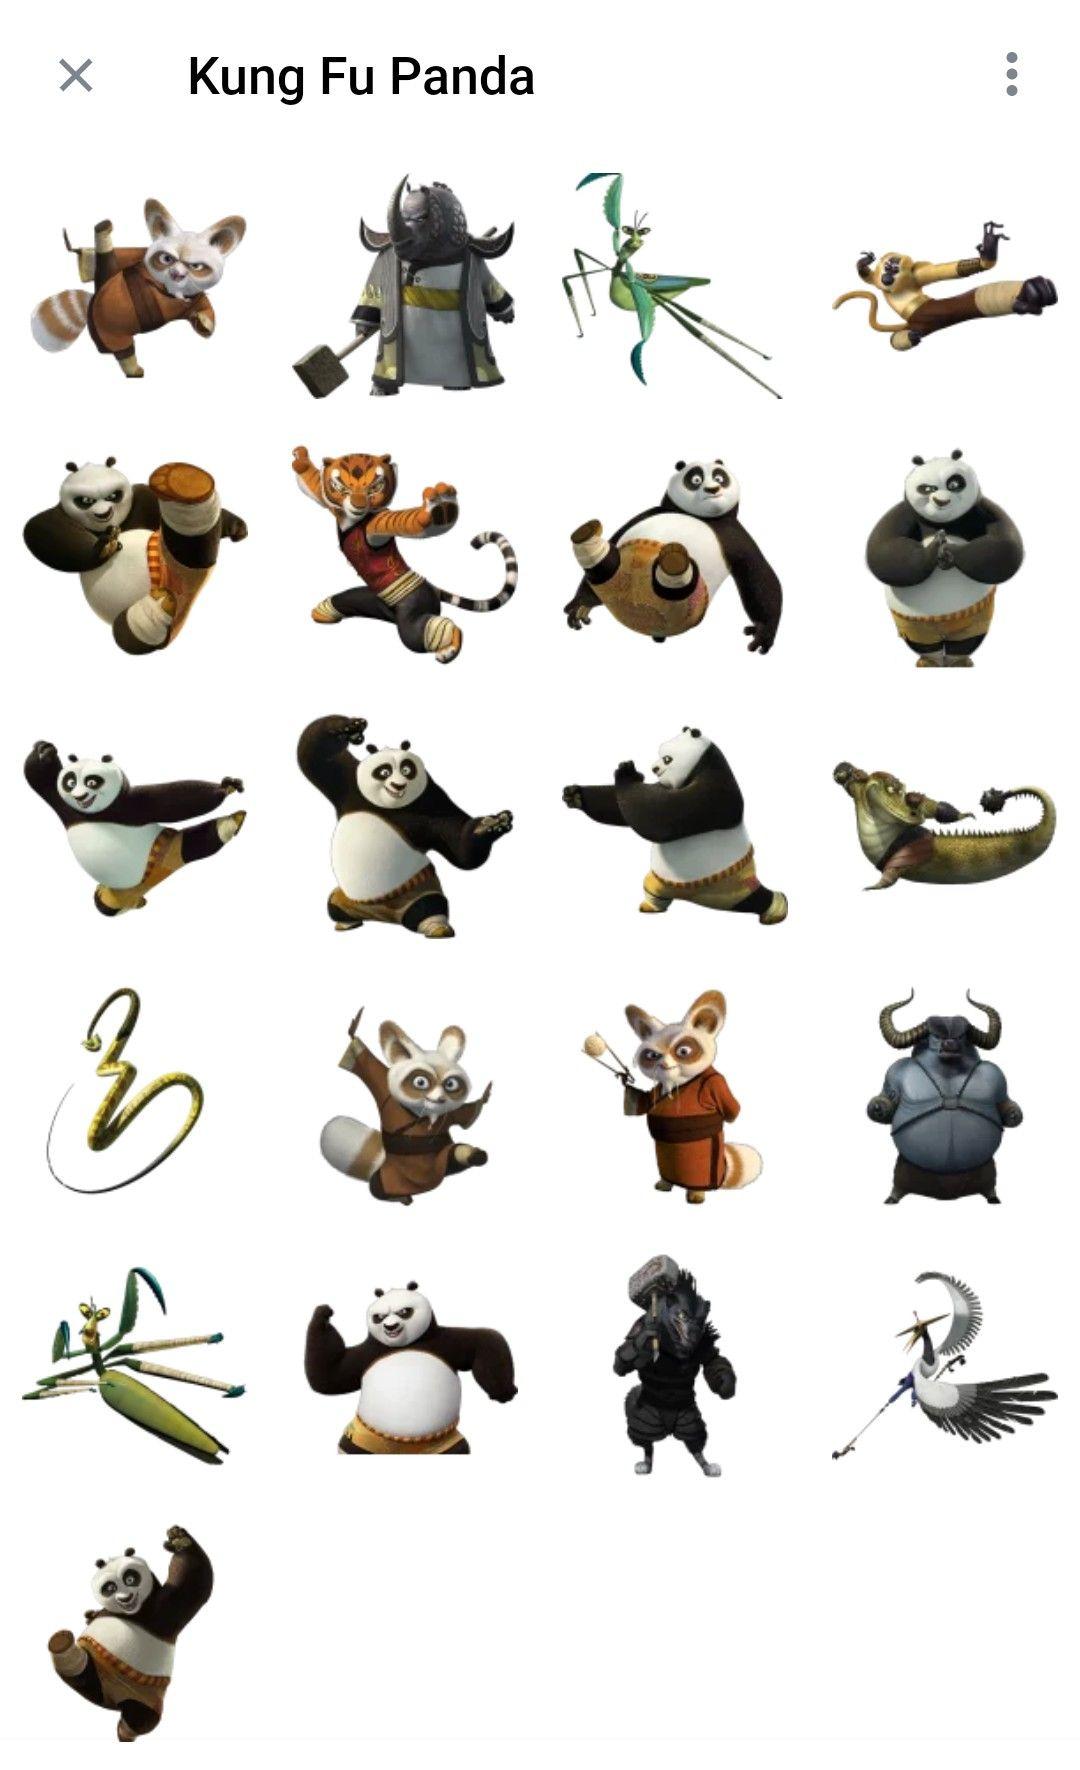 Kung fu Panda Telegram sticker packs Kung fu panda